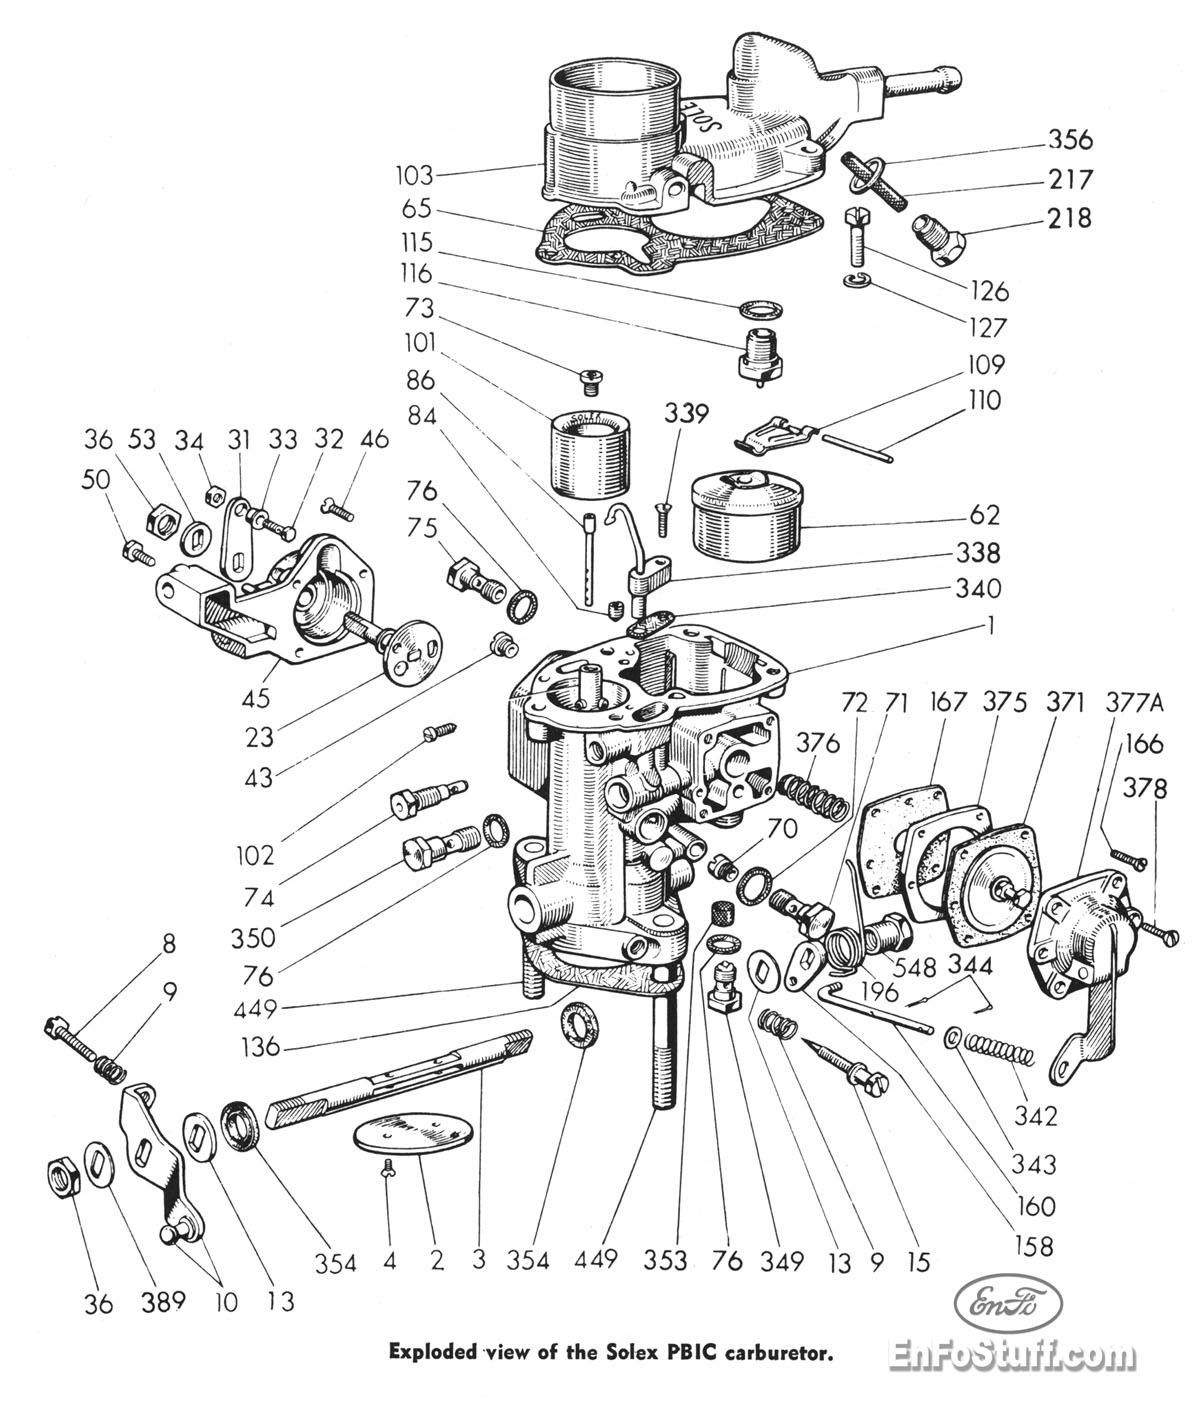 stromberg carburetor diagram honeywell aquastat l6006c wiring marvel schebler aircraft